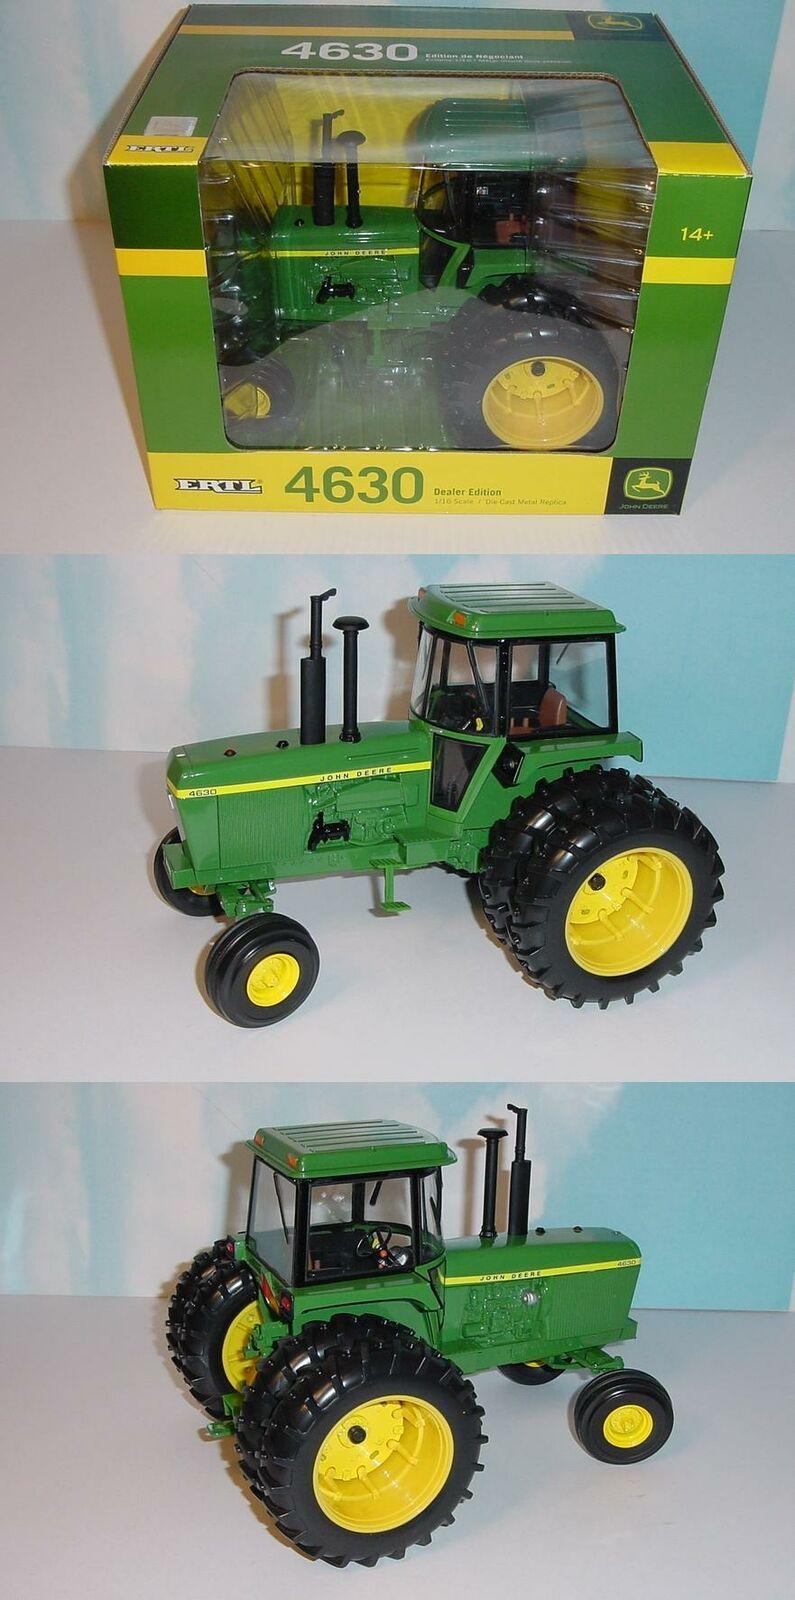 1 16 John Deere 4630 Dealer Edition Tractor W Duals NIB